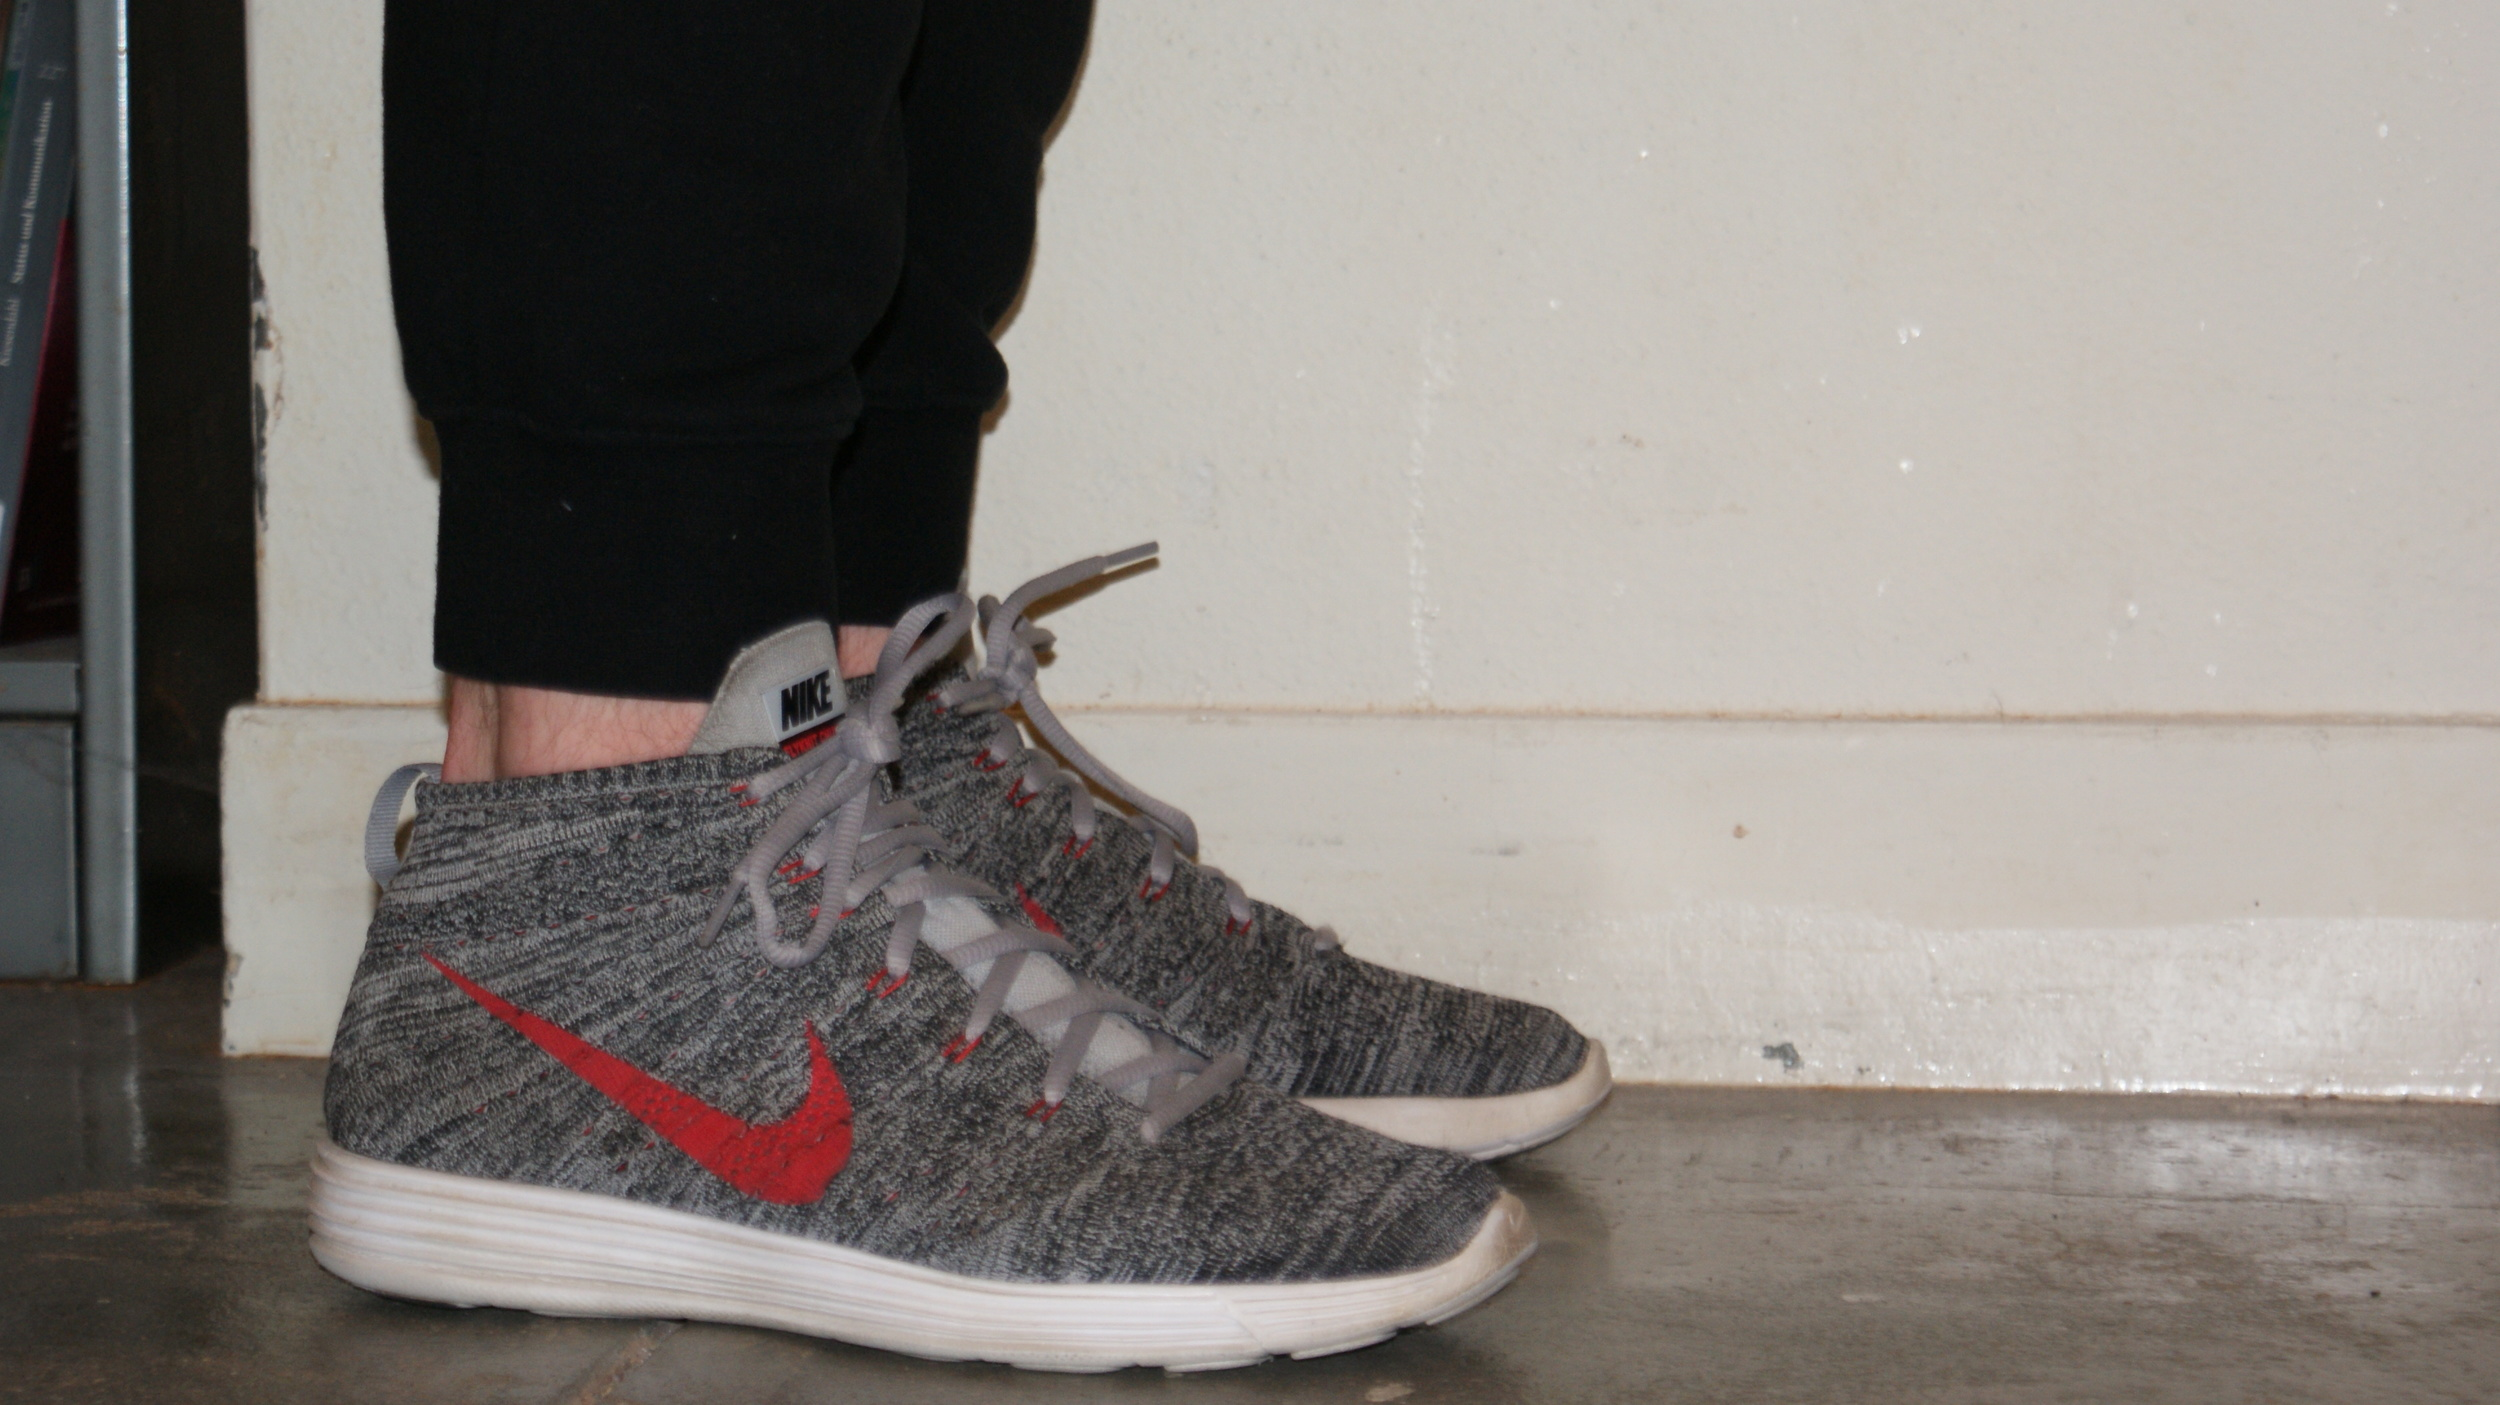 ola Casa de la carretera tortura  Shoe Review: Nike Lunar Flyknit Chukka